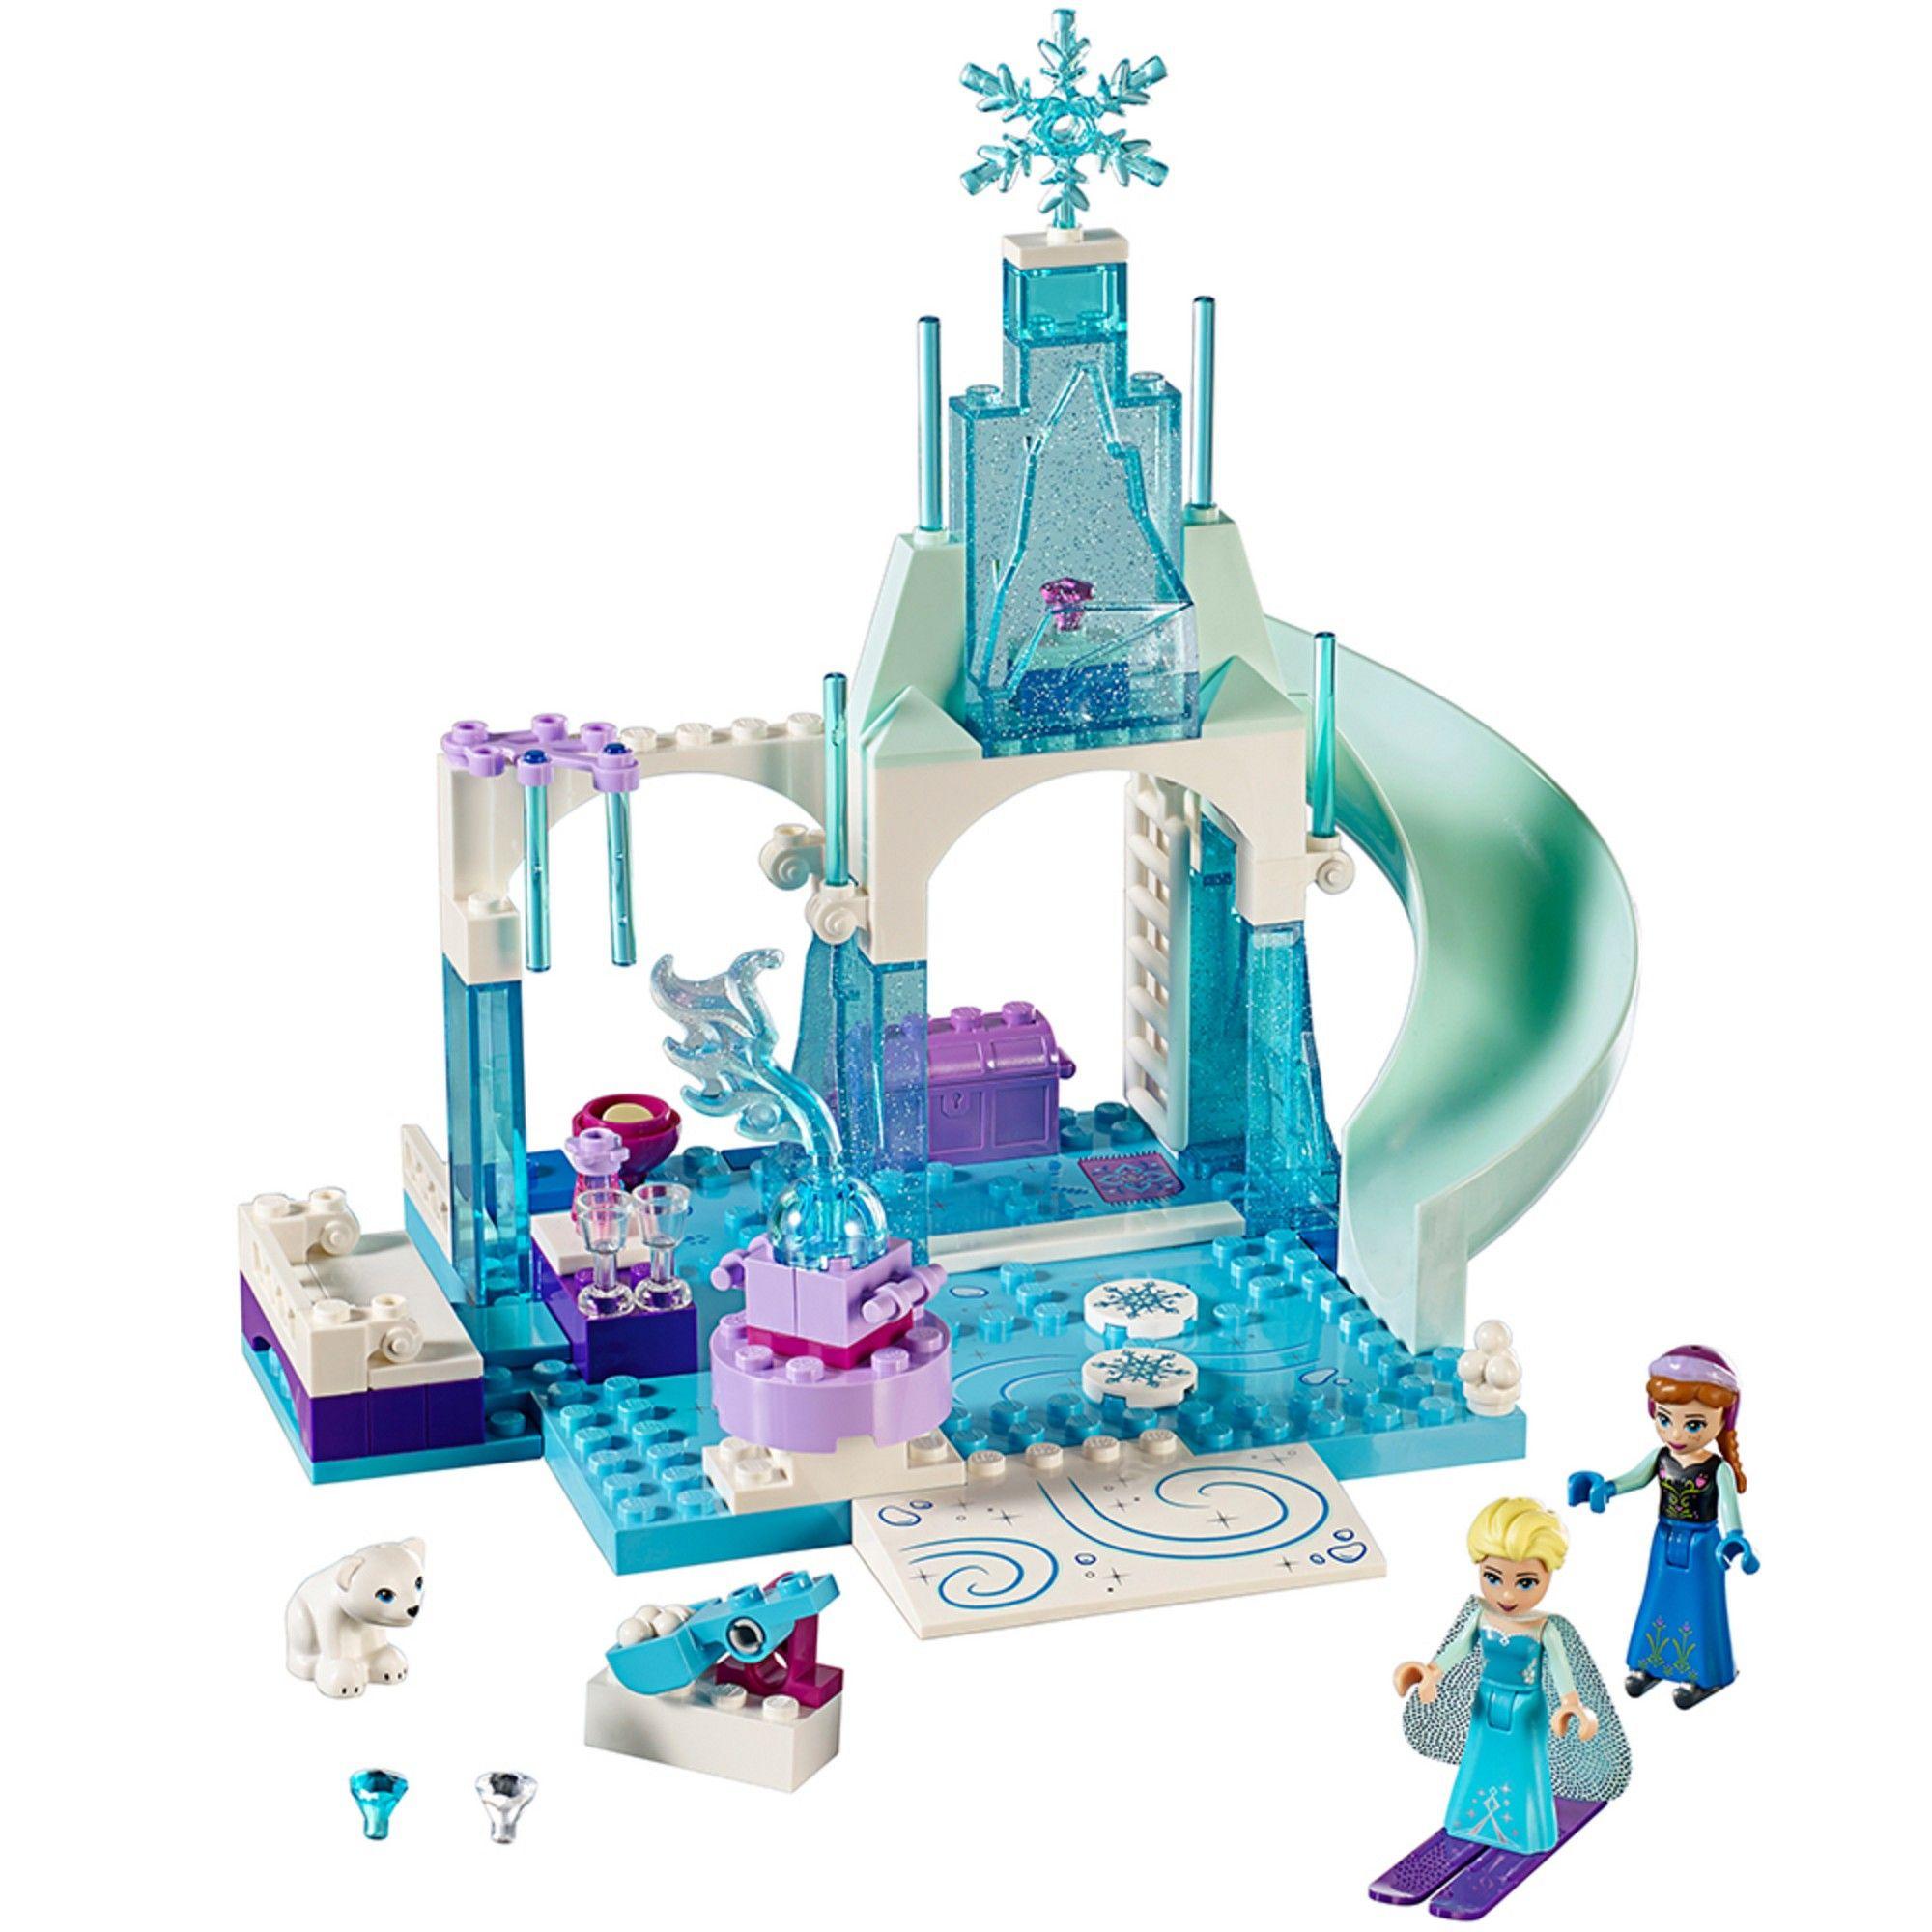 LEGO l Disney Frozen Anna  Elsa/'s Frozen Playground 10736 Disney Princess Toy